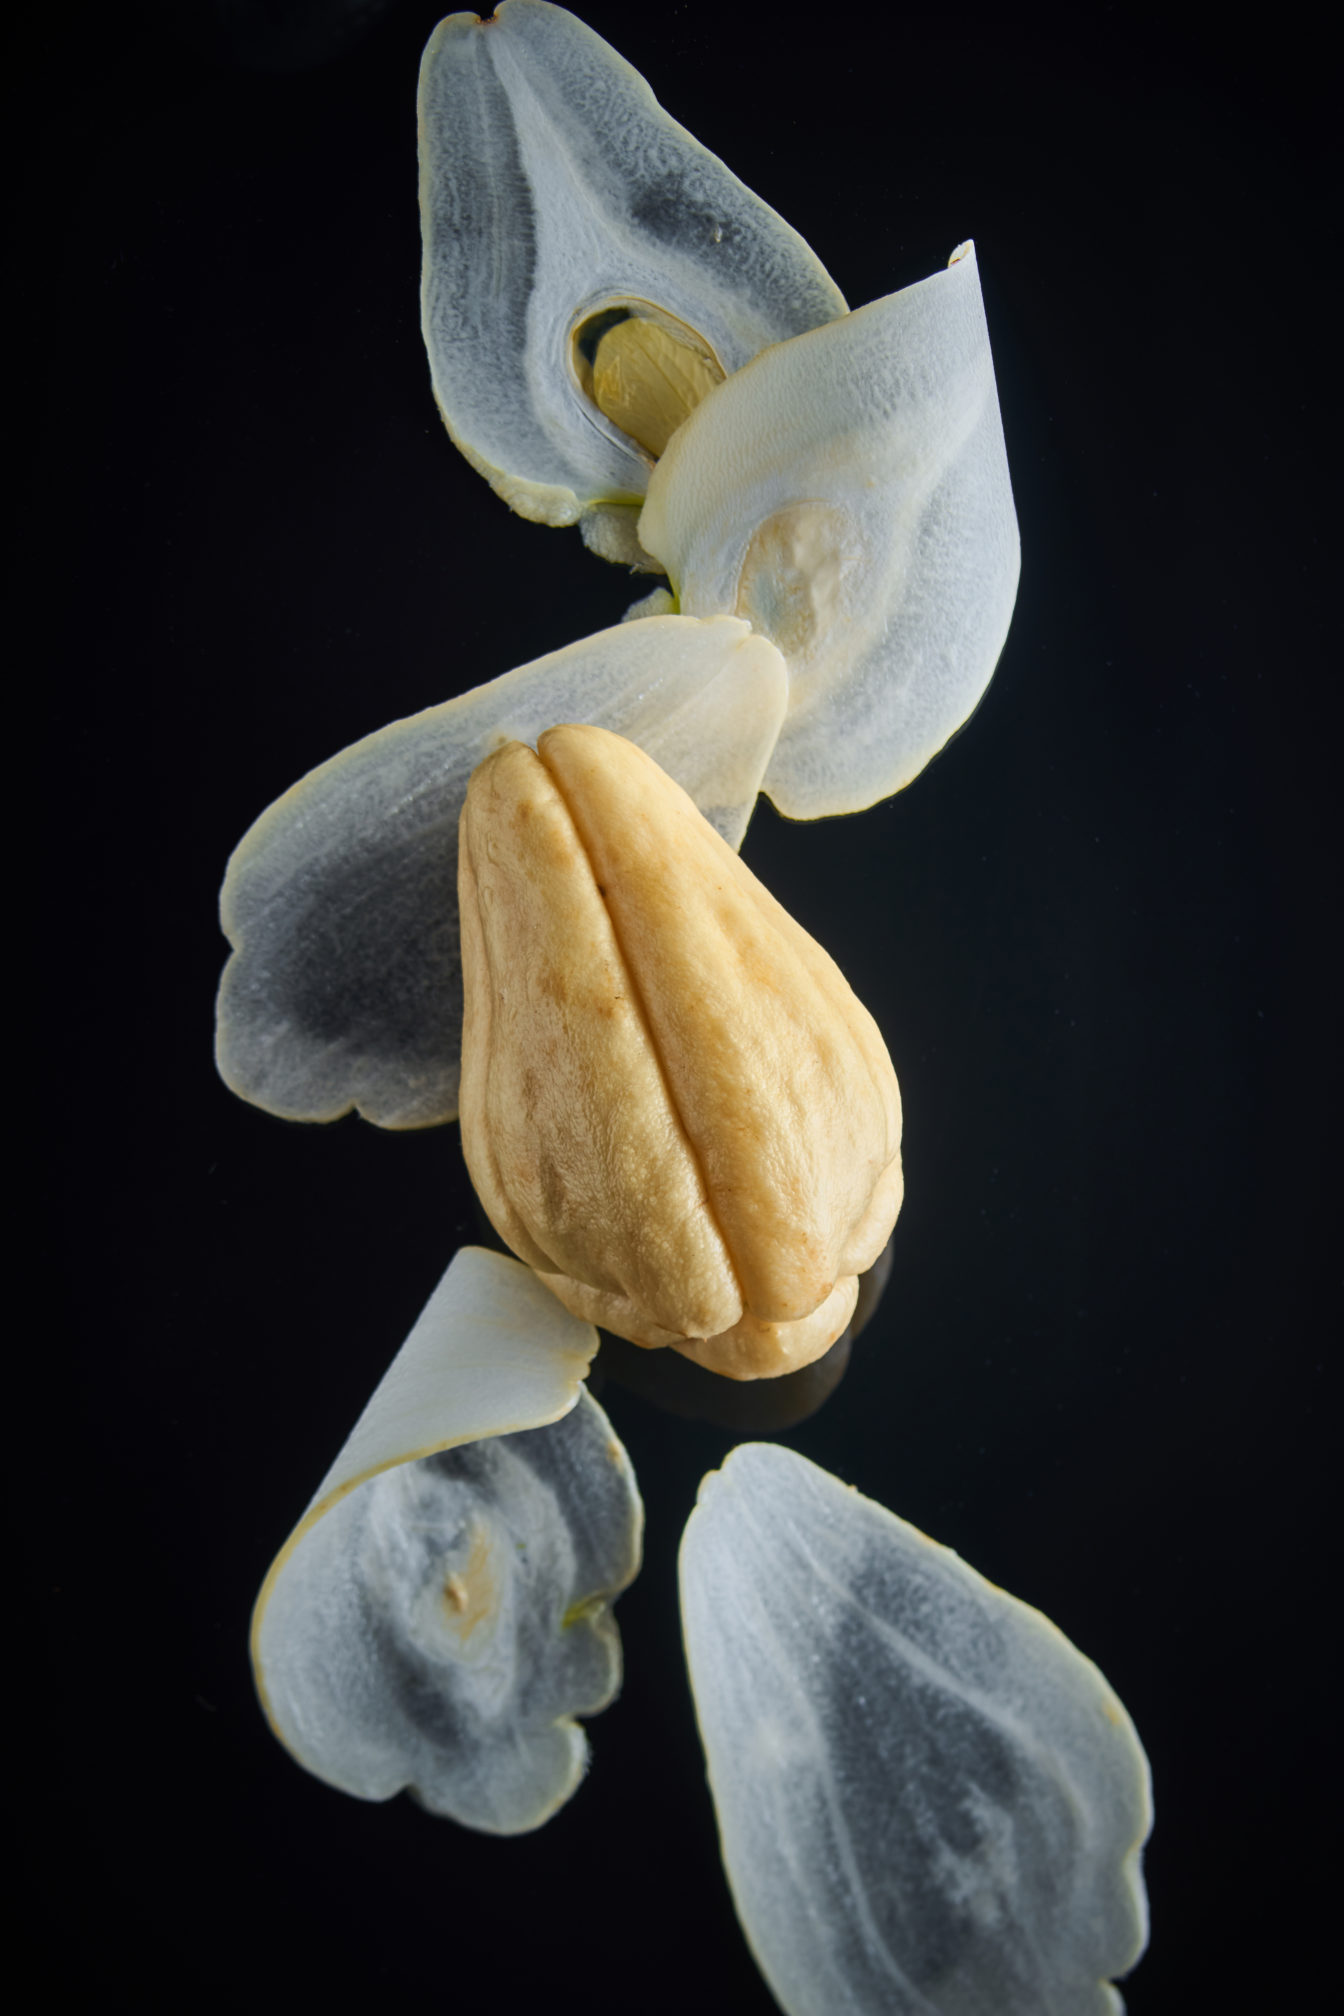 capexo-lilot-fruits-exotique-chrisophine-chayotte-blanche-france